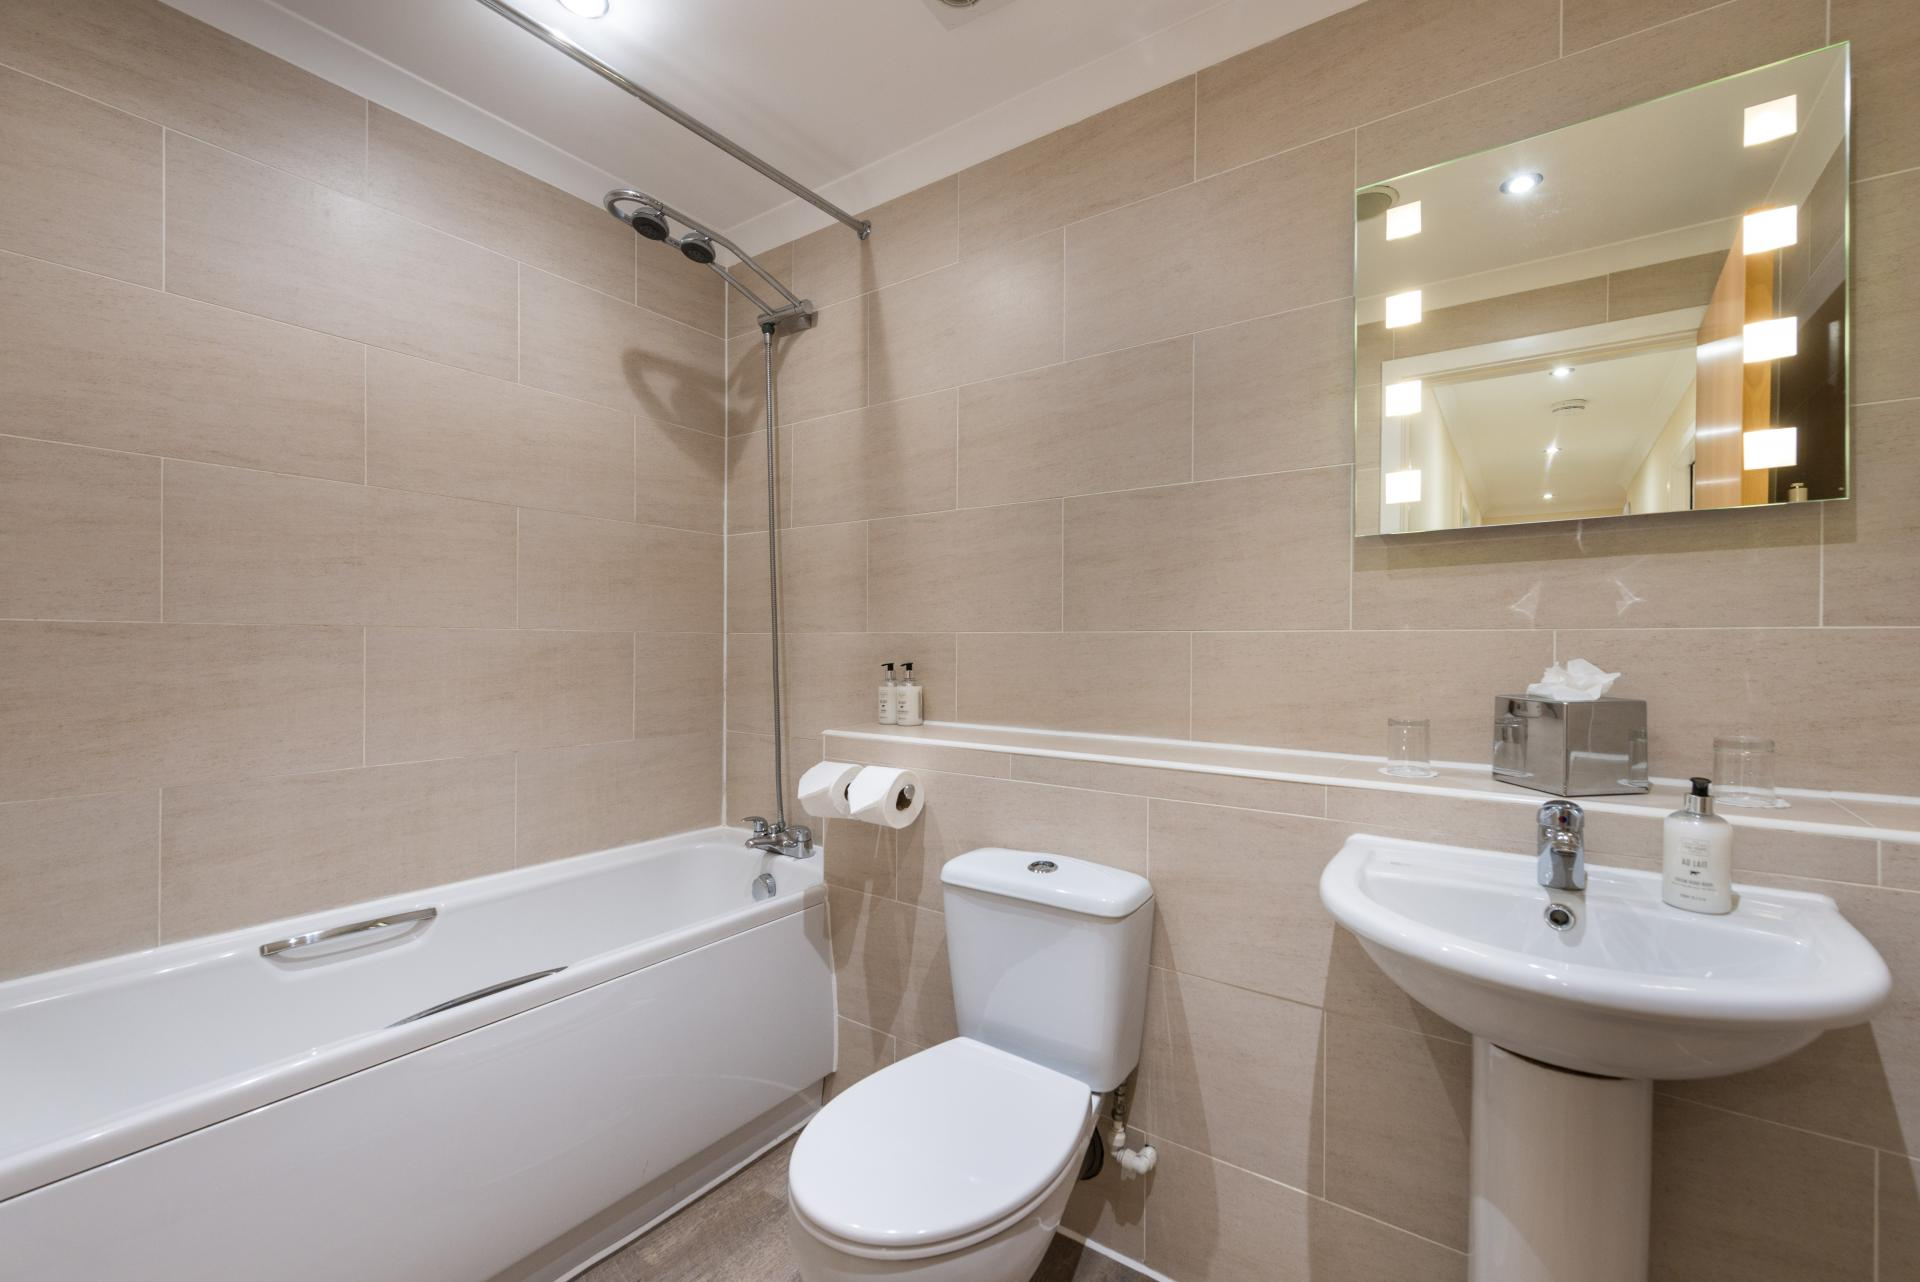 Bathroom at the Harris Apartments - Citybase Apartments